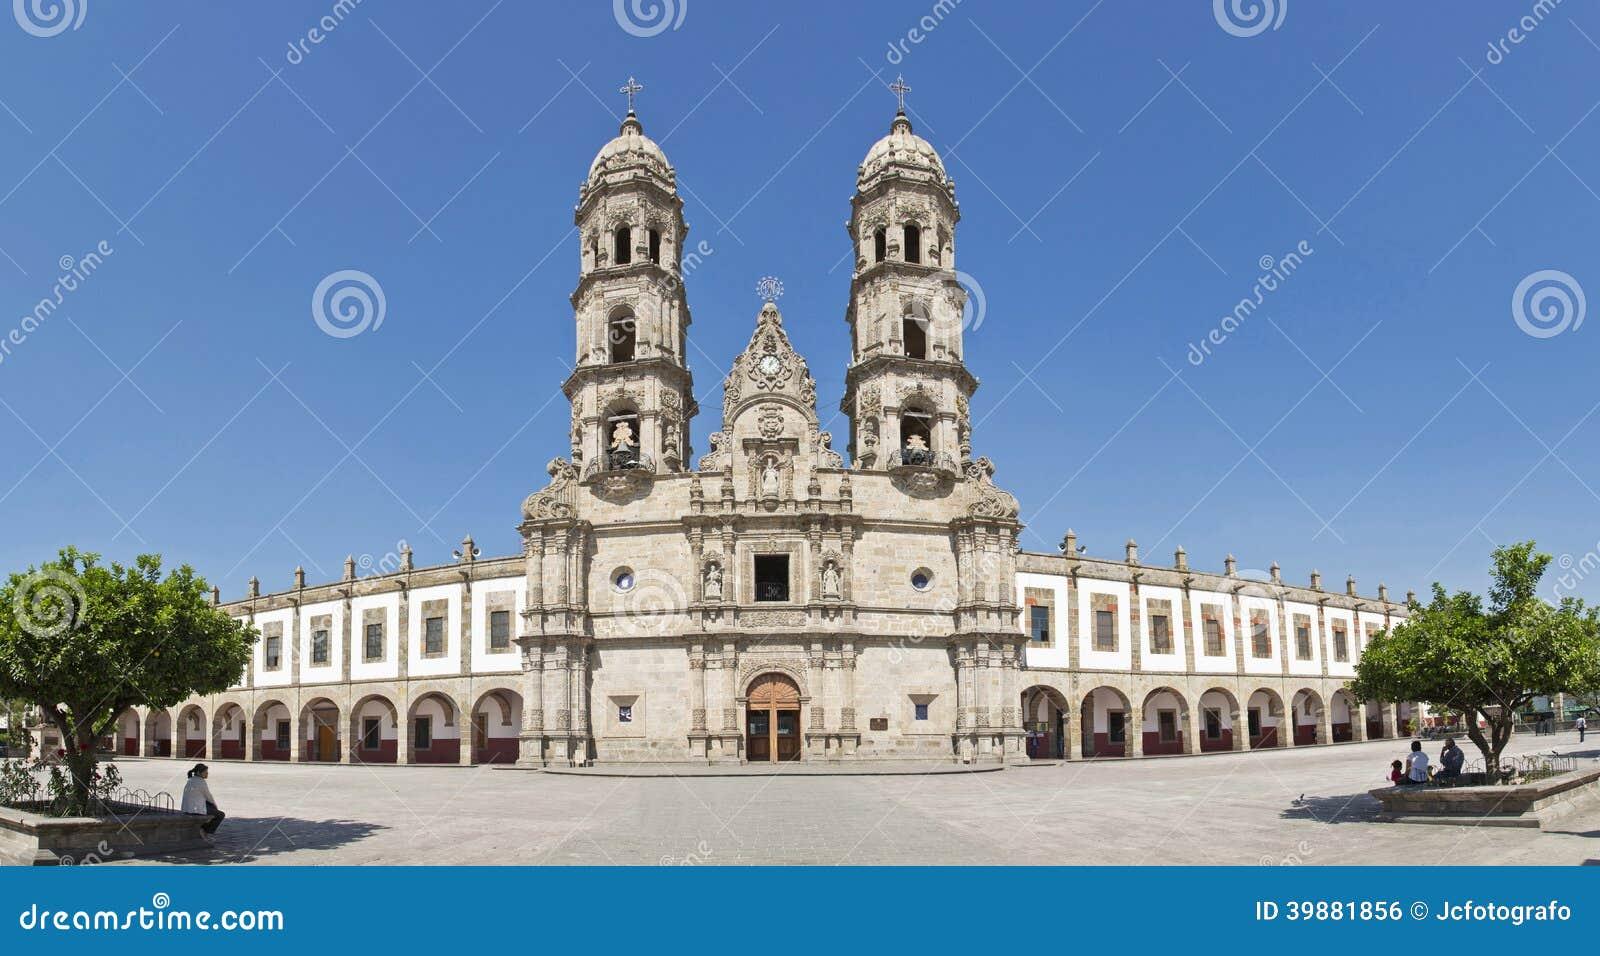 Toeristenmonumenten van de stad van Guadalajara